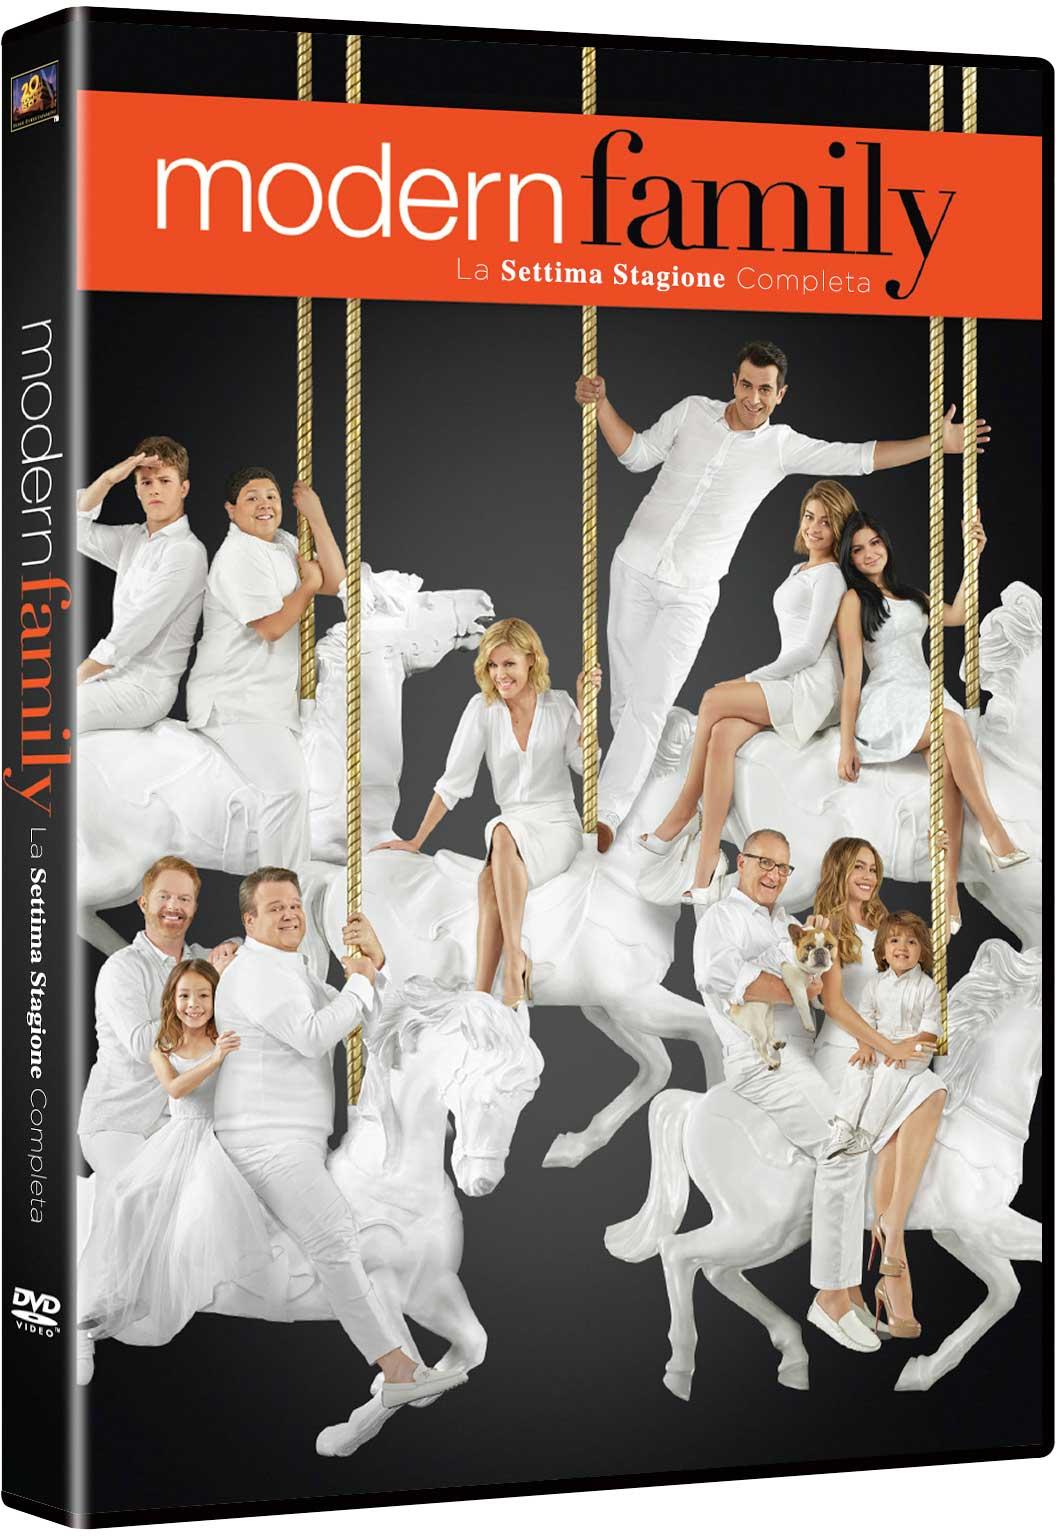 COF.MODERN FAMILY - STAGIONE 07 (3 DVD) (DVD)